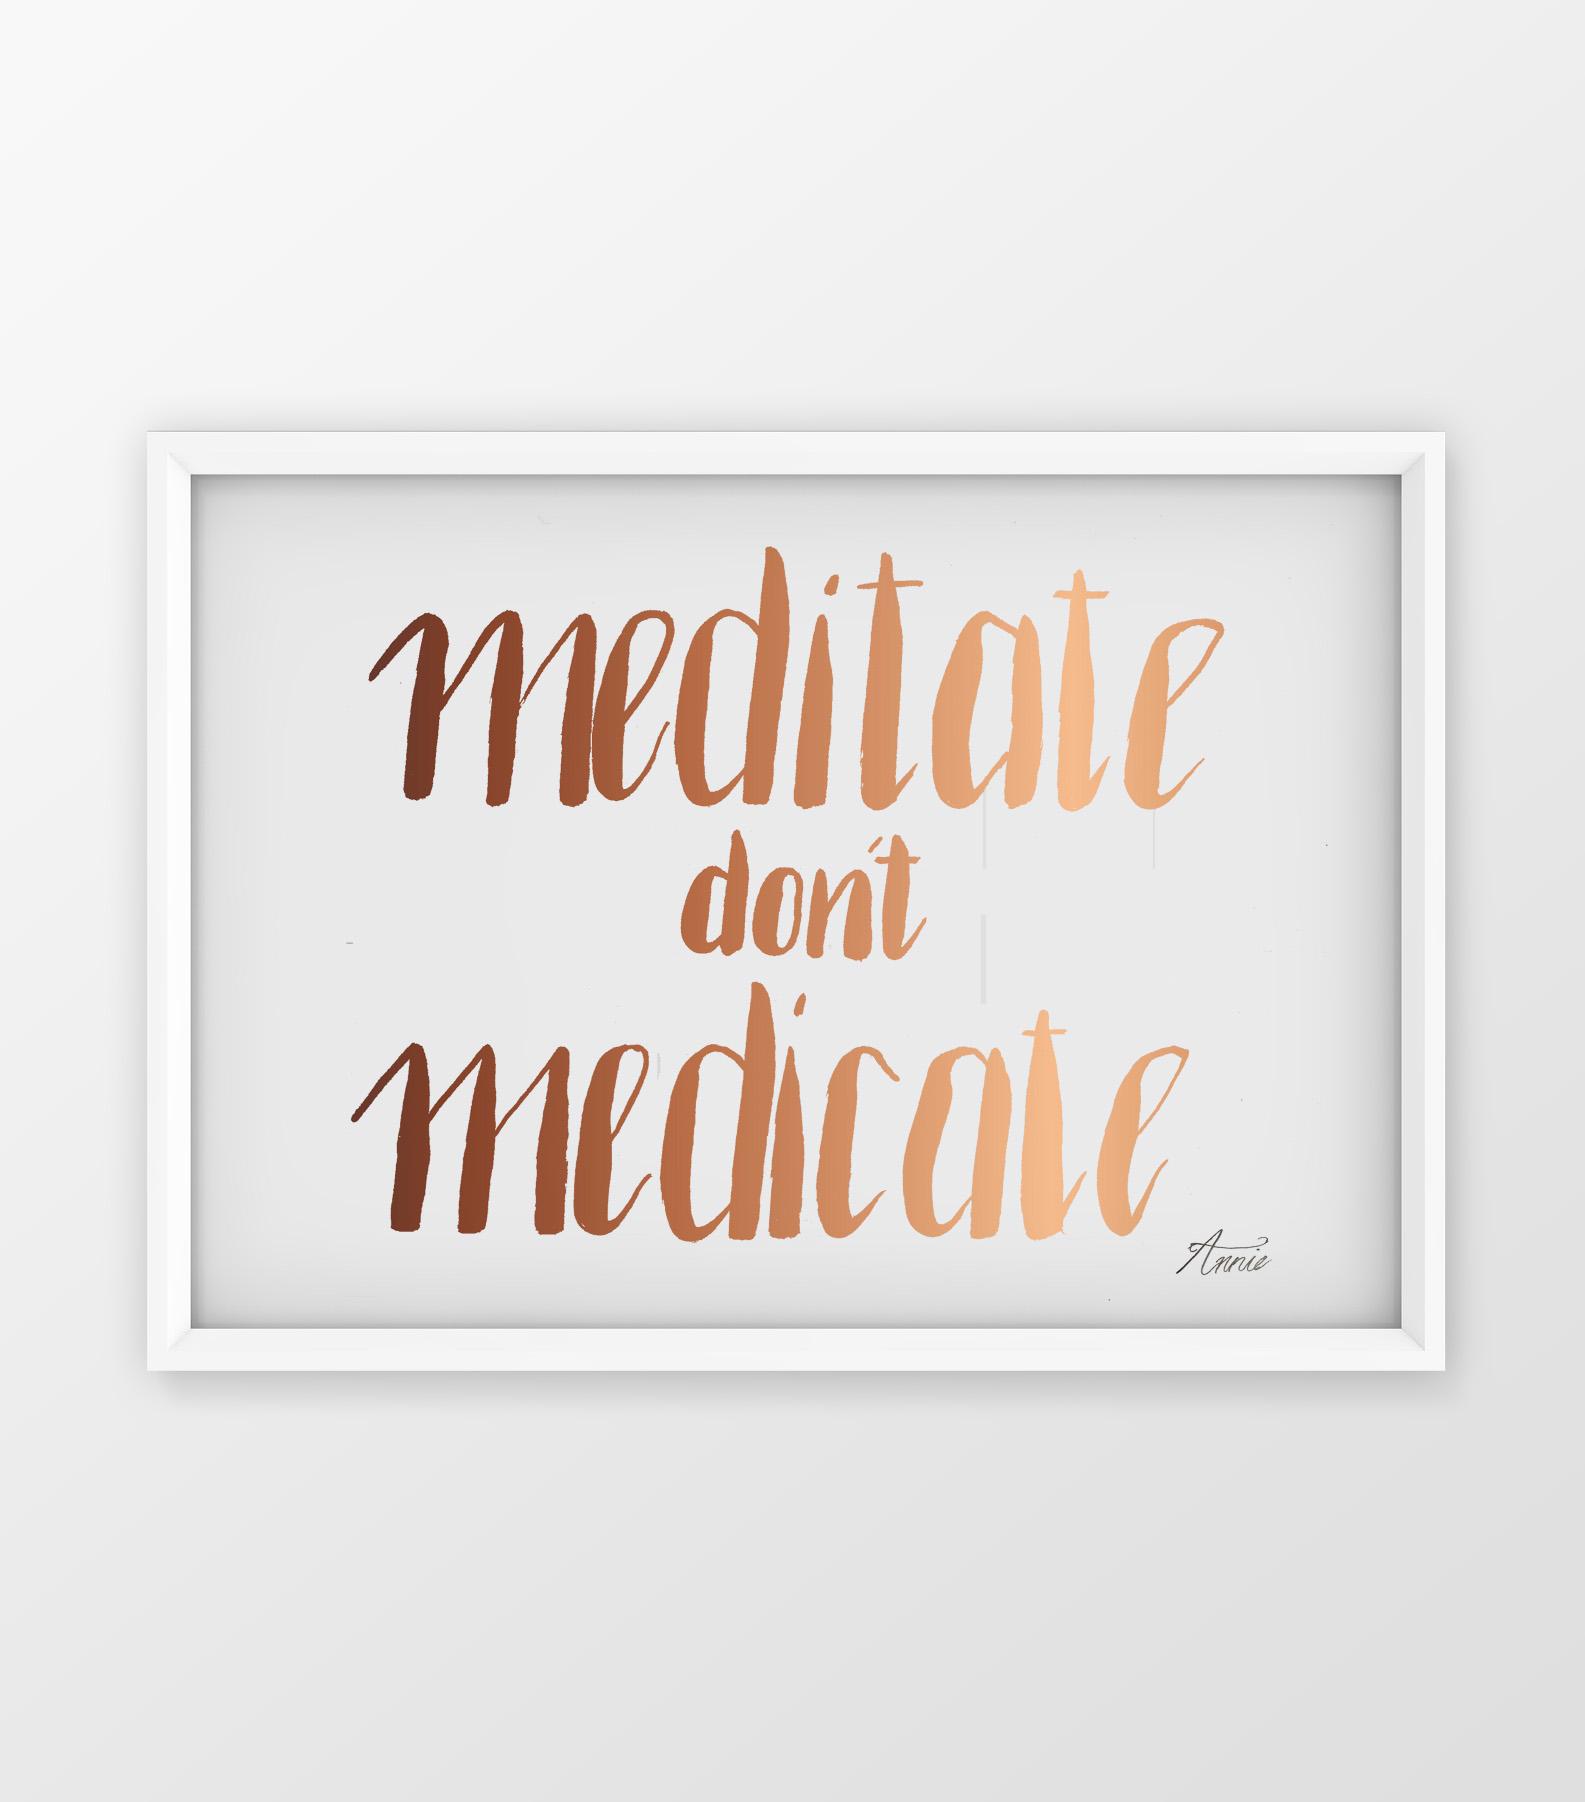 MeditateDontMedicate-PosterB.jpg